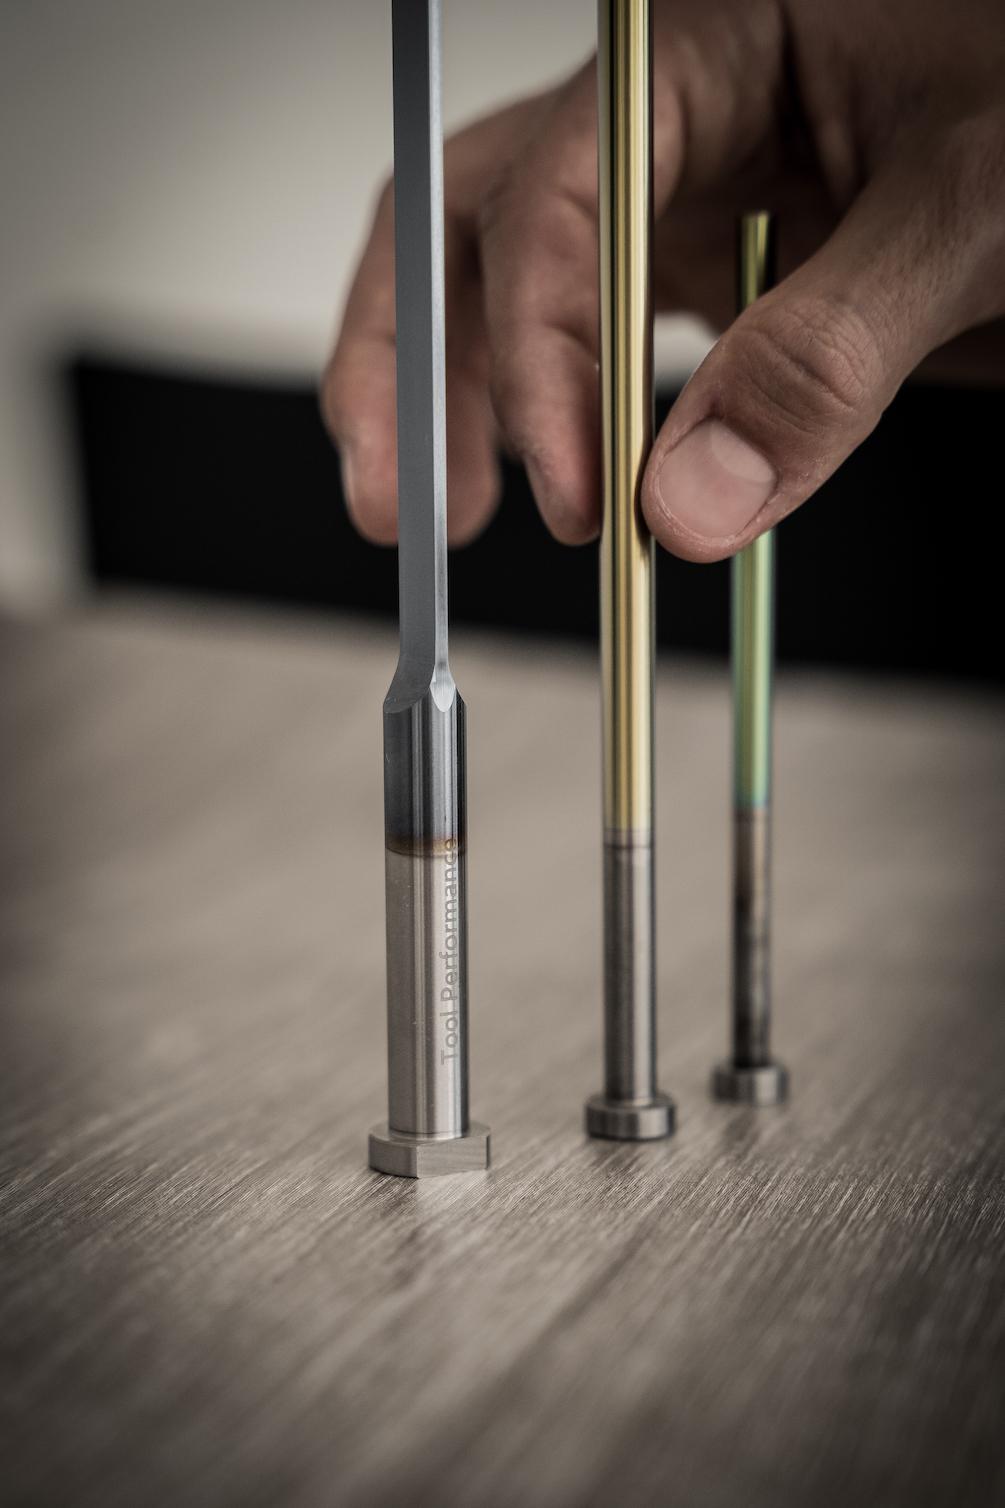 Bunte stehende Auswerfer der Firma Tool Performance